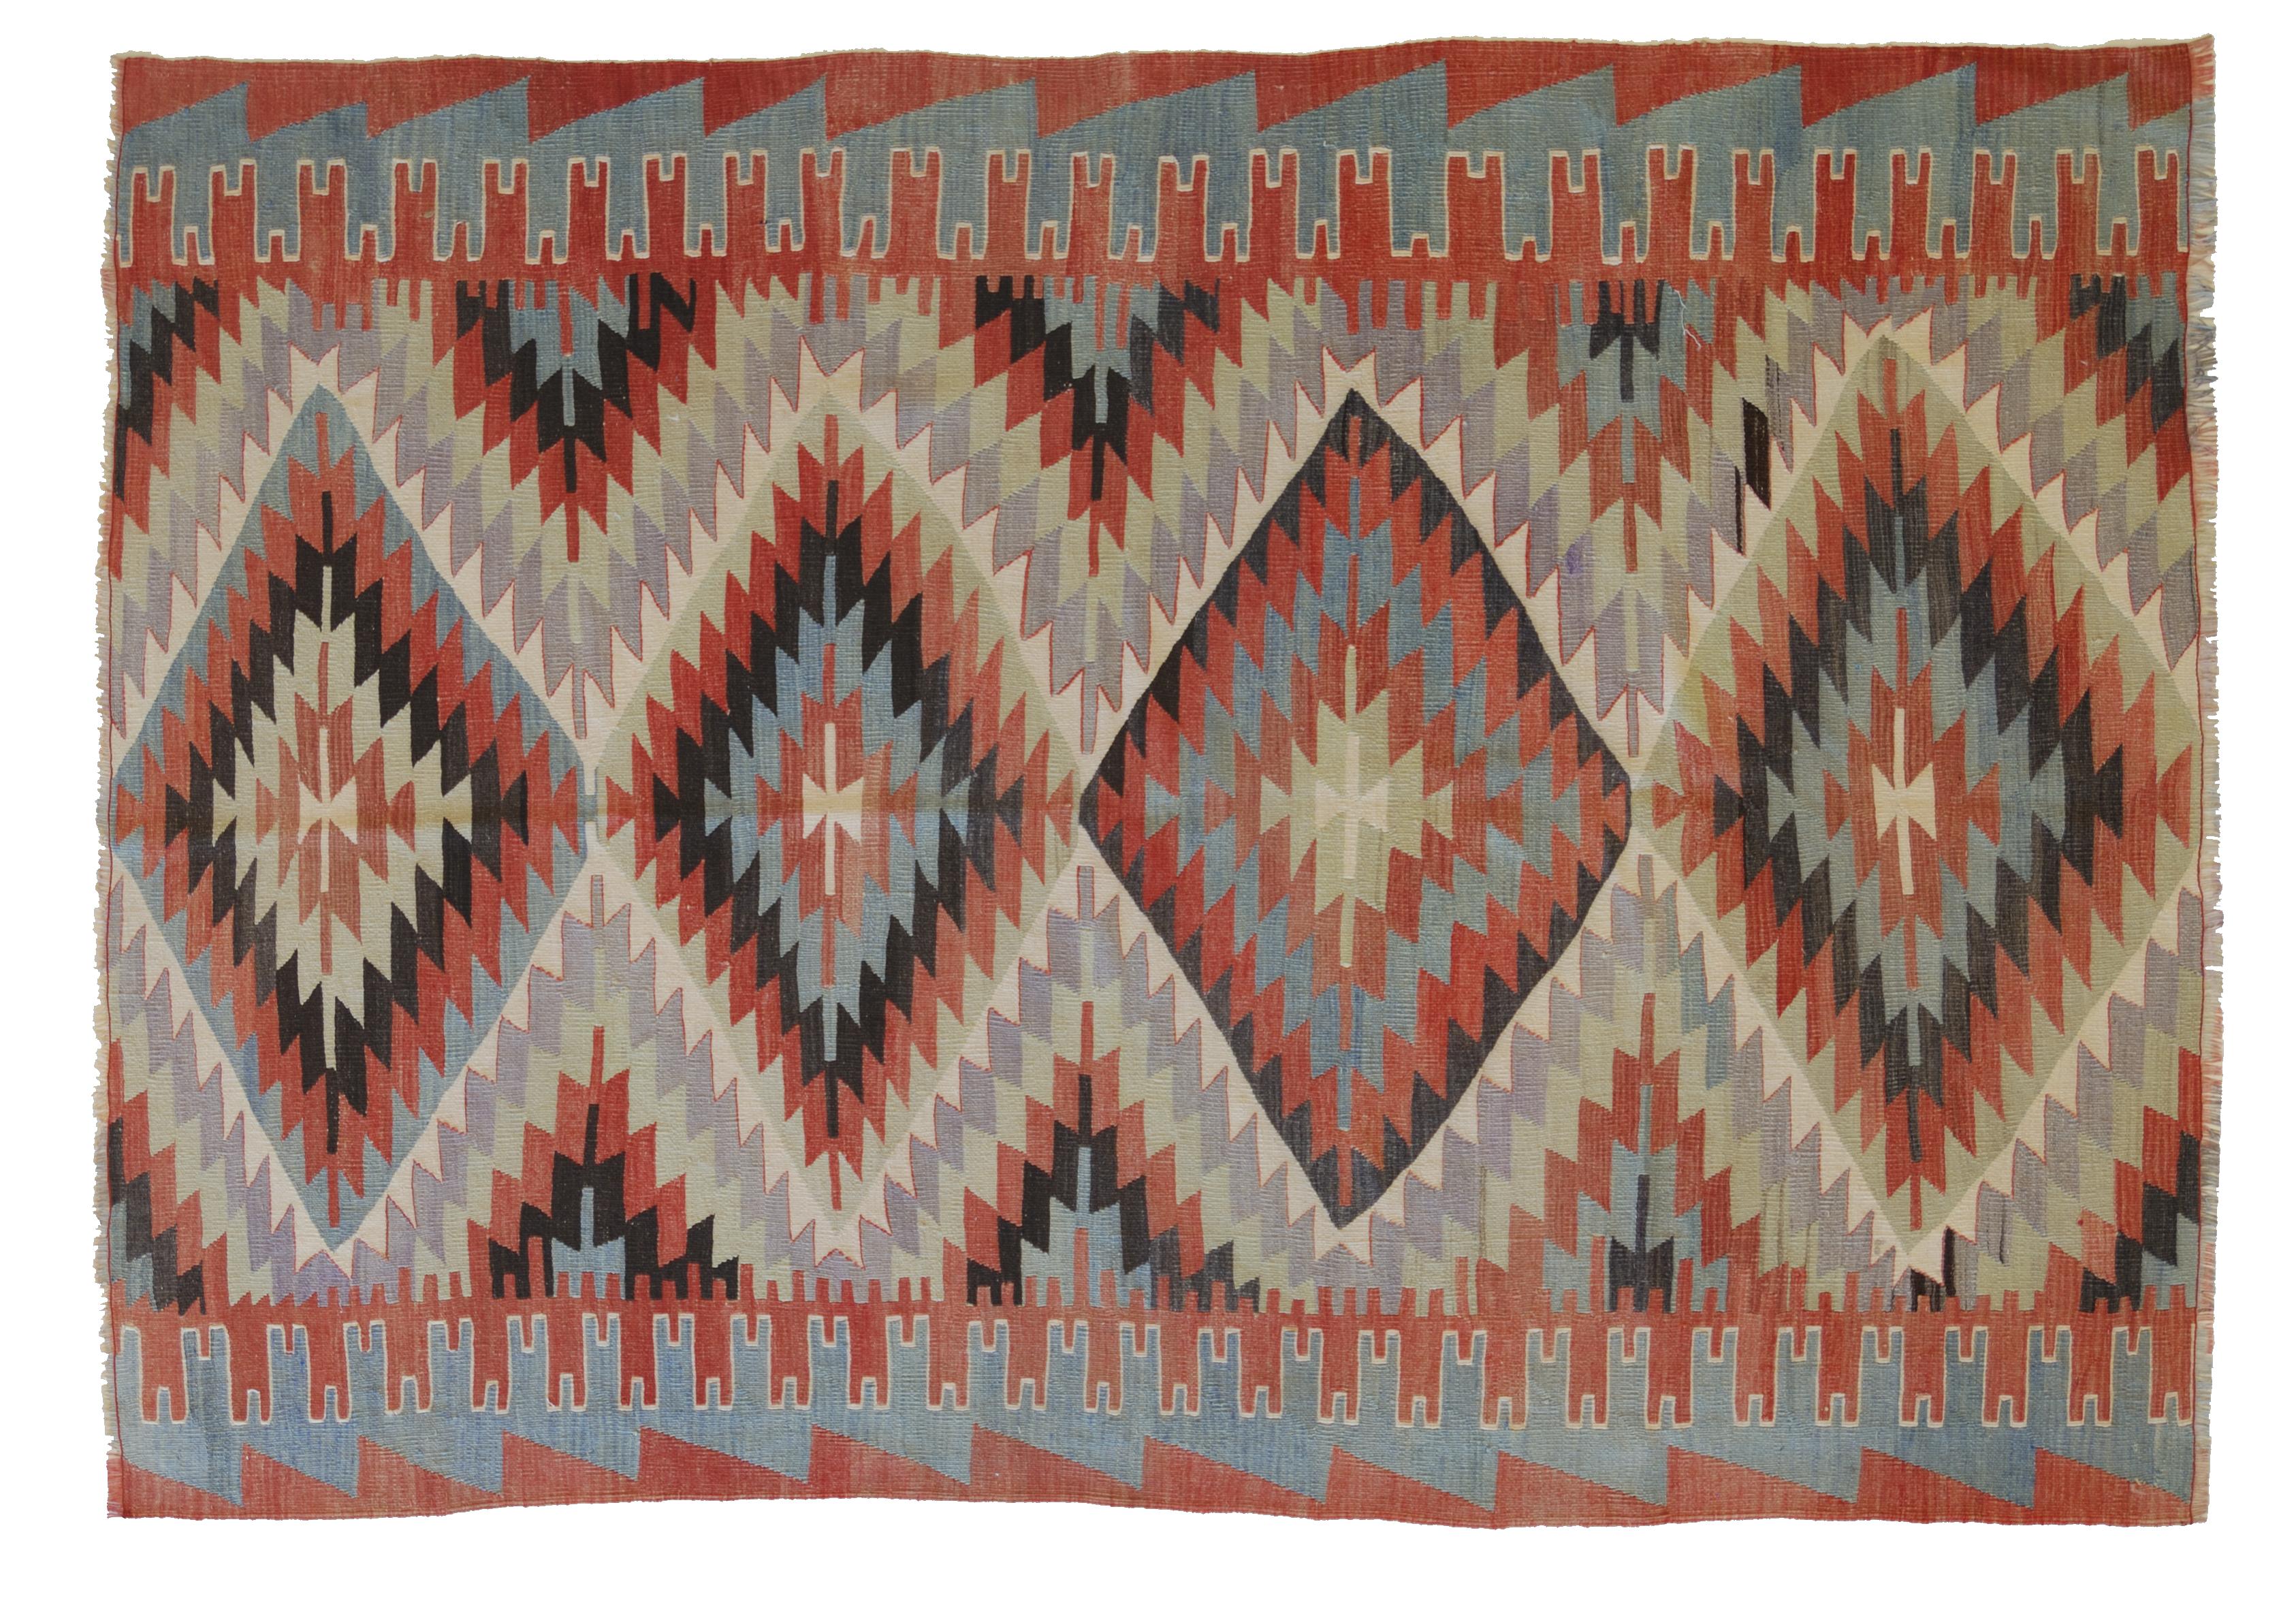 Tappeti Kilim Antichi : Denizili tagliato morandi tappeti